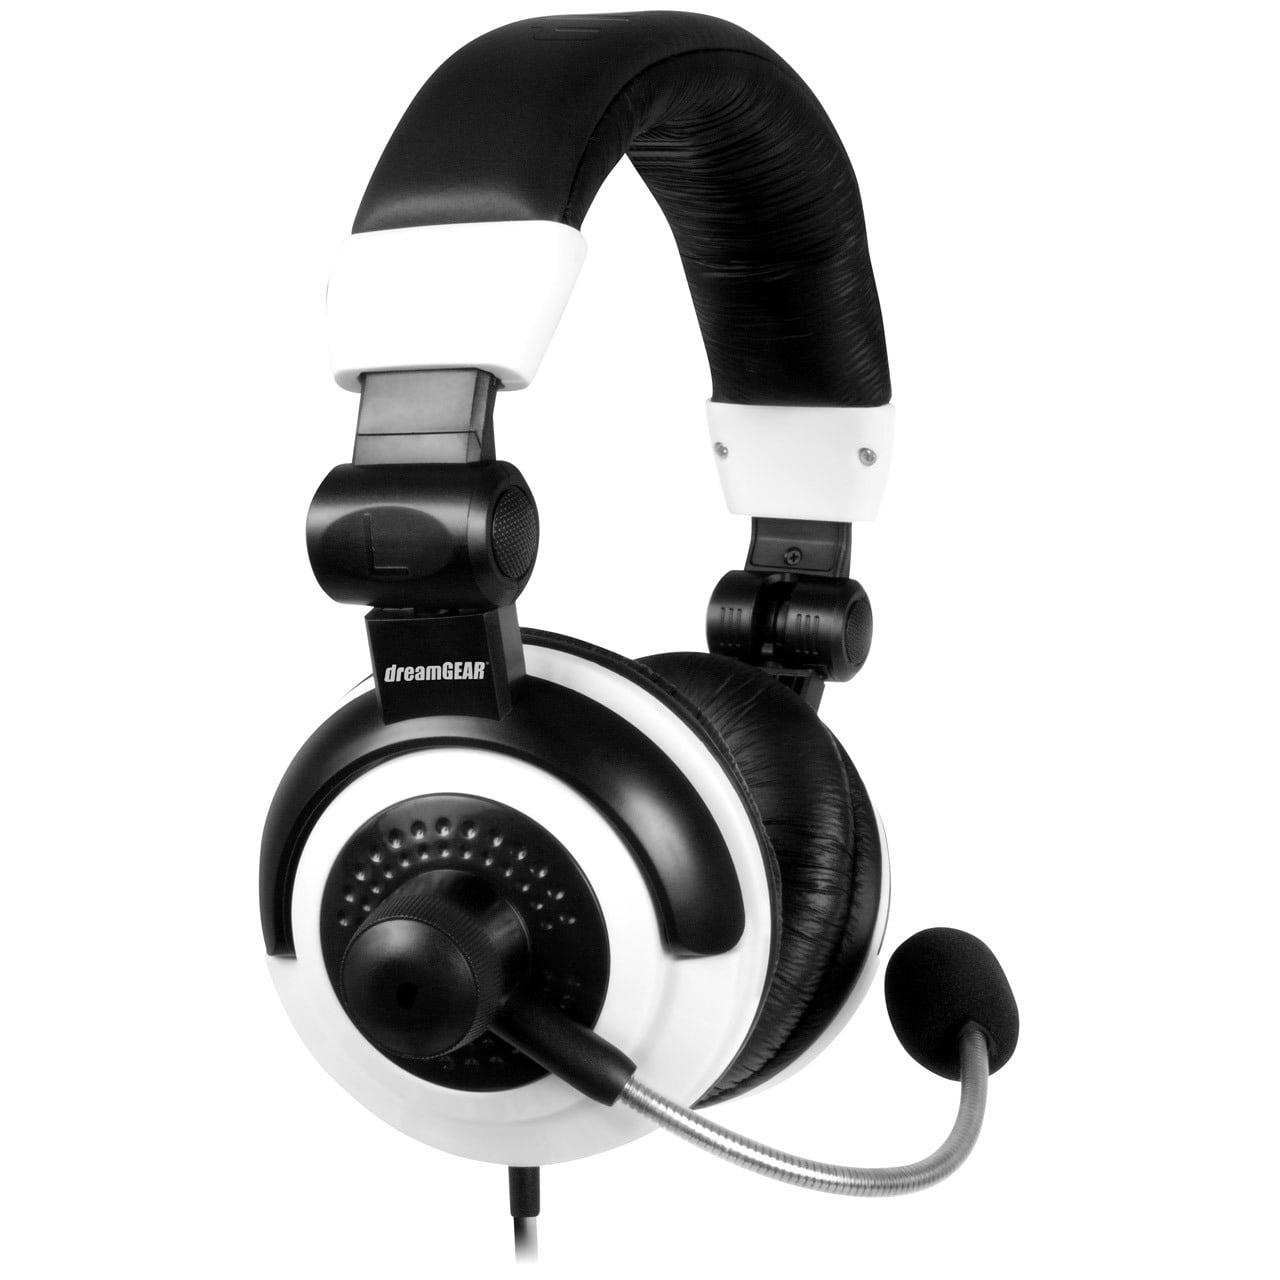 DREAMGEAR DG360-1720 Xbox 360(R) Elite Gaming Headset